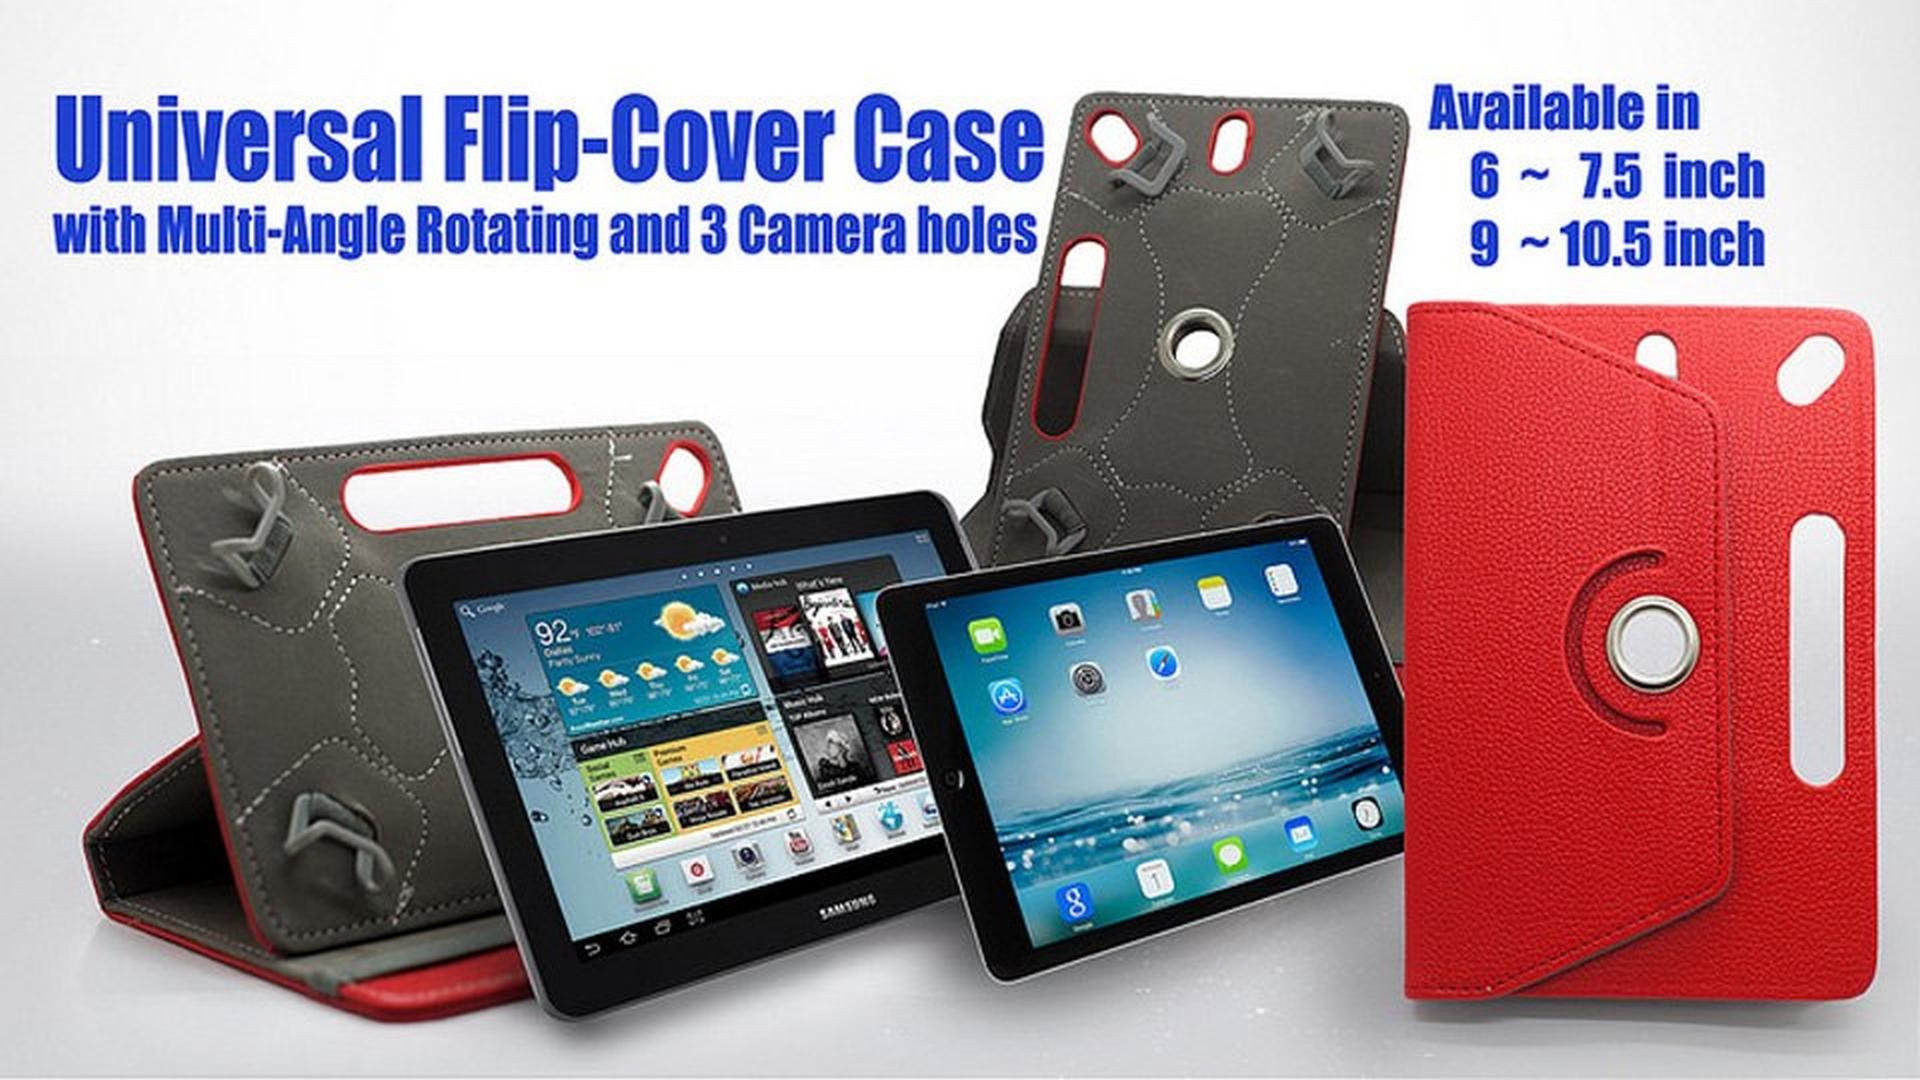 Universals Filp-Cover Case